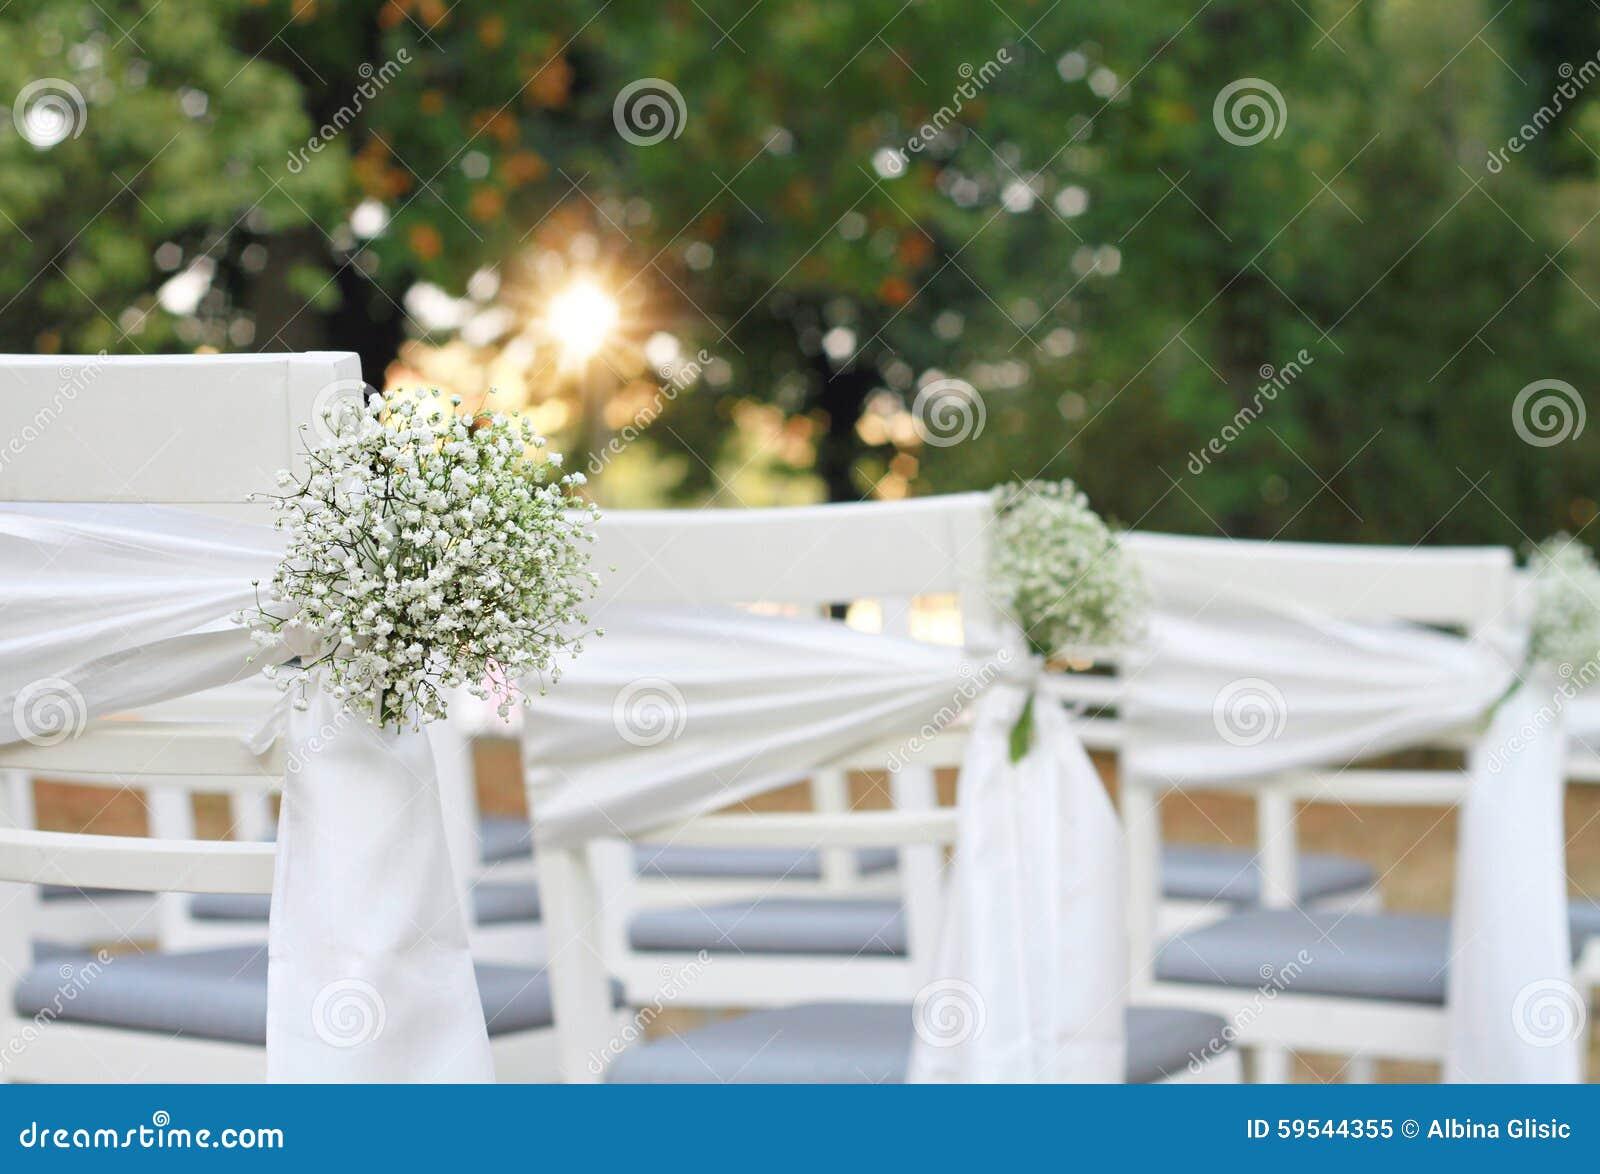 Decoration Chaise Exterieure Mariage